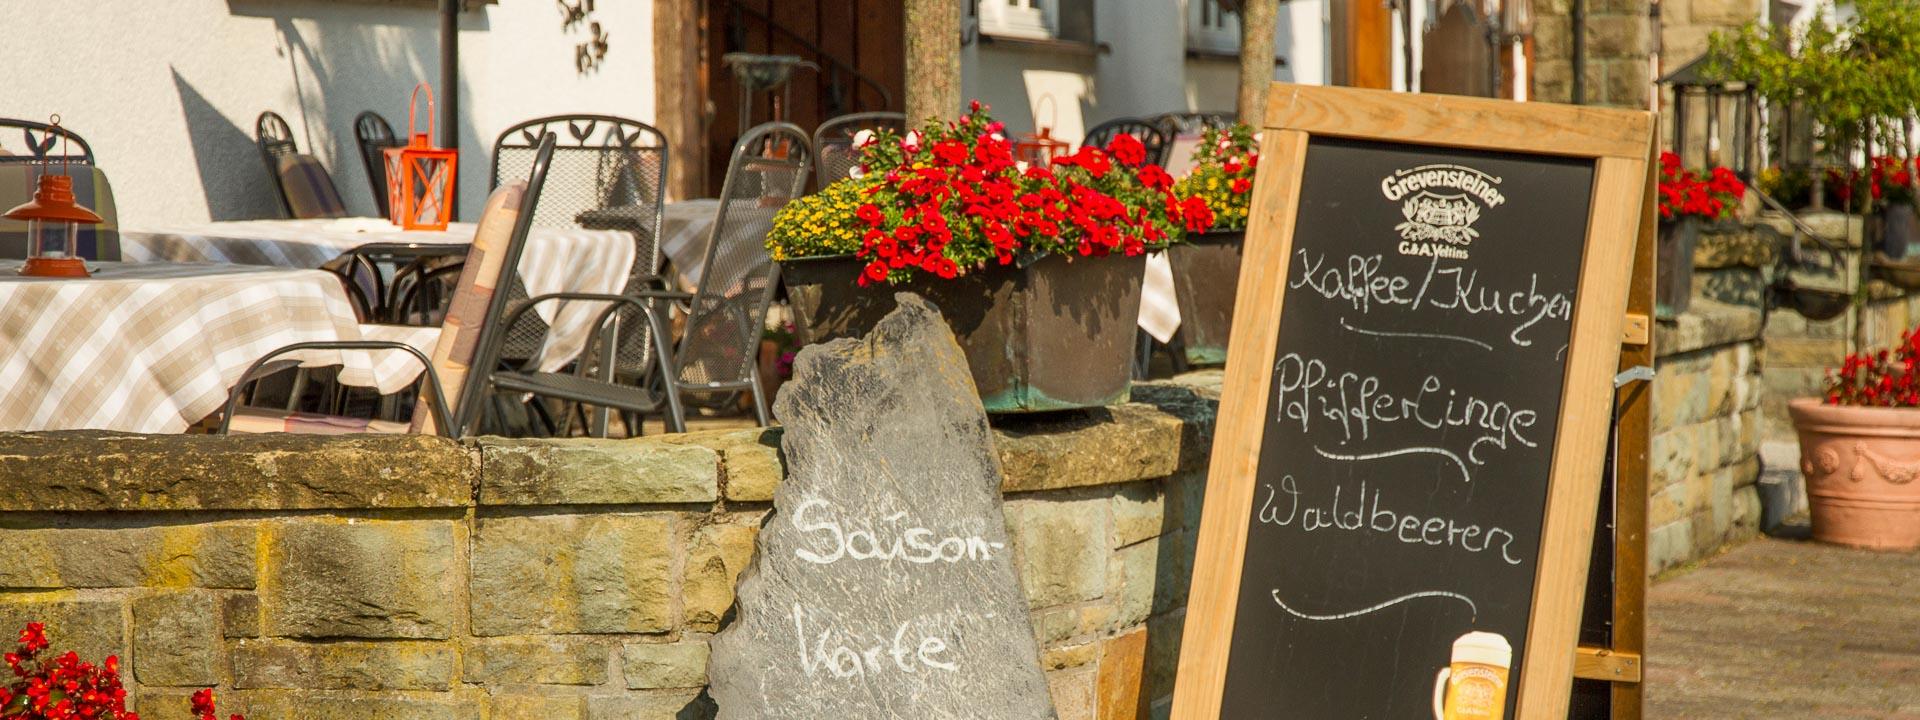 Gastgeber & Gastronomie